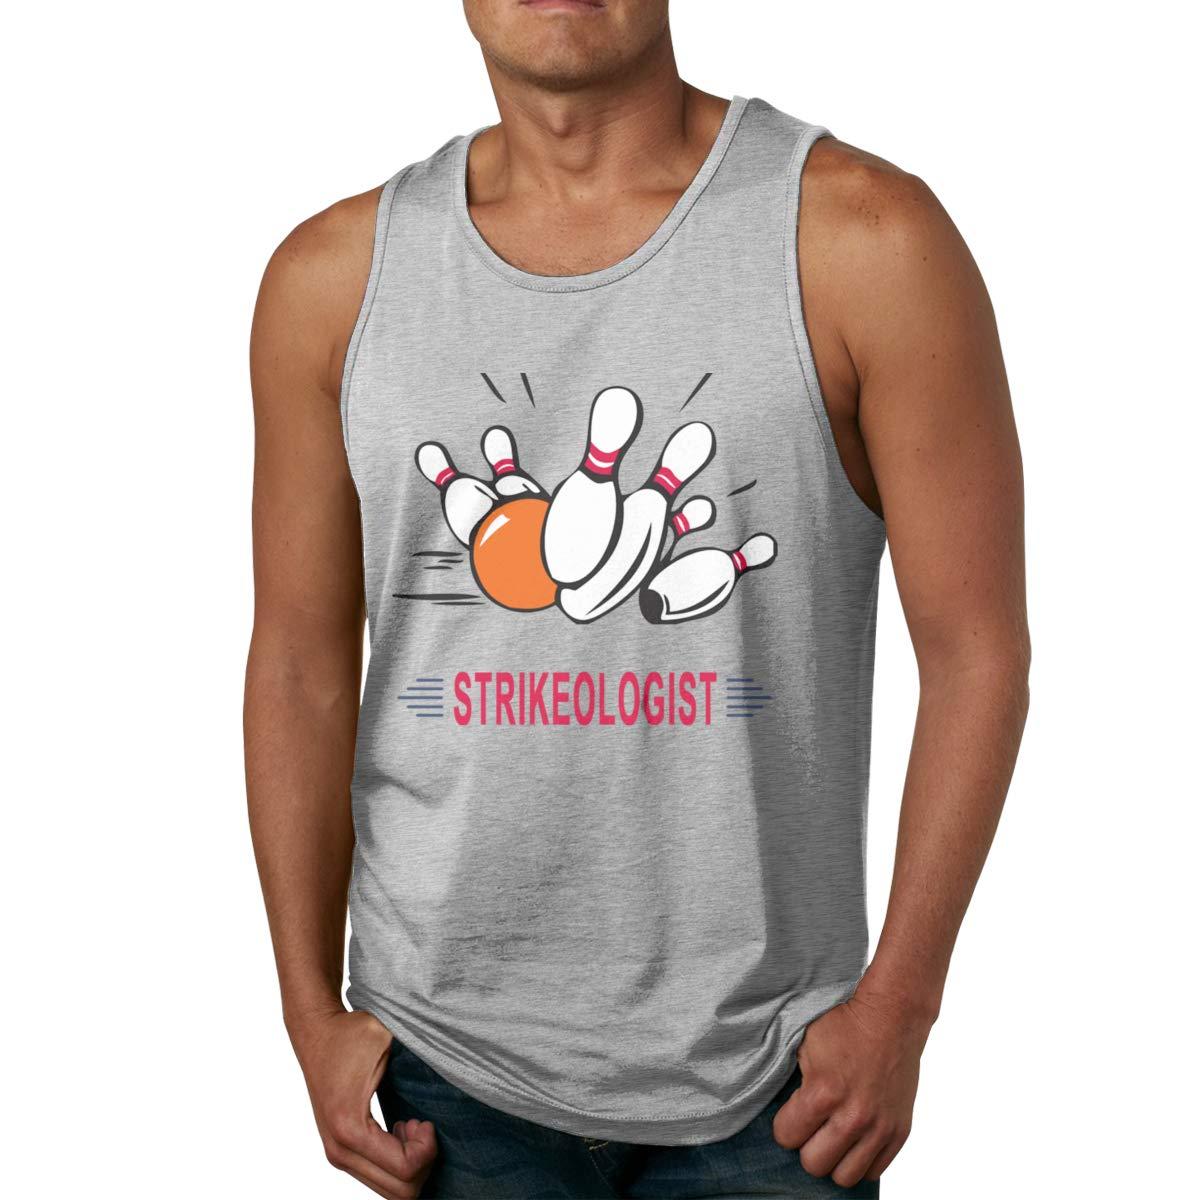 Seuriamin Strikeologist Bowling S Casual Workout Sleeveless Tank Top T Shirt